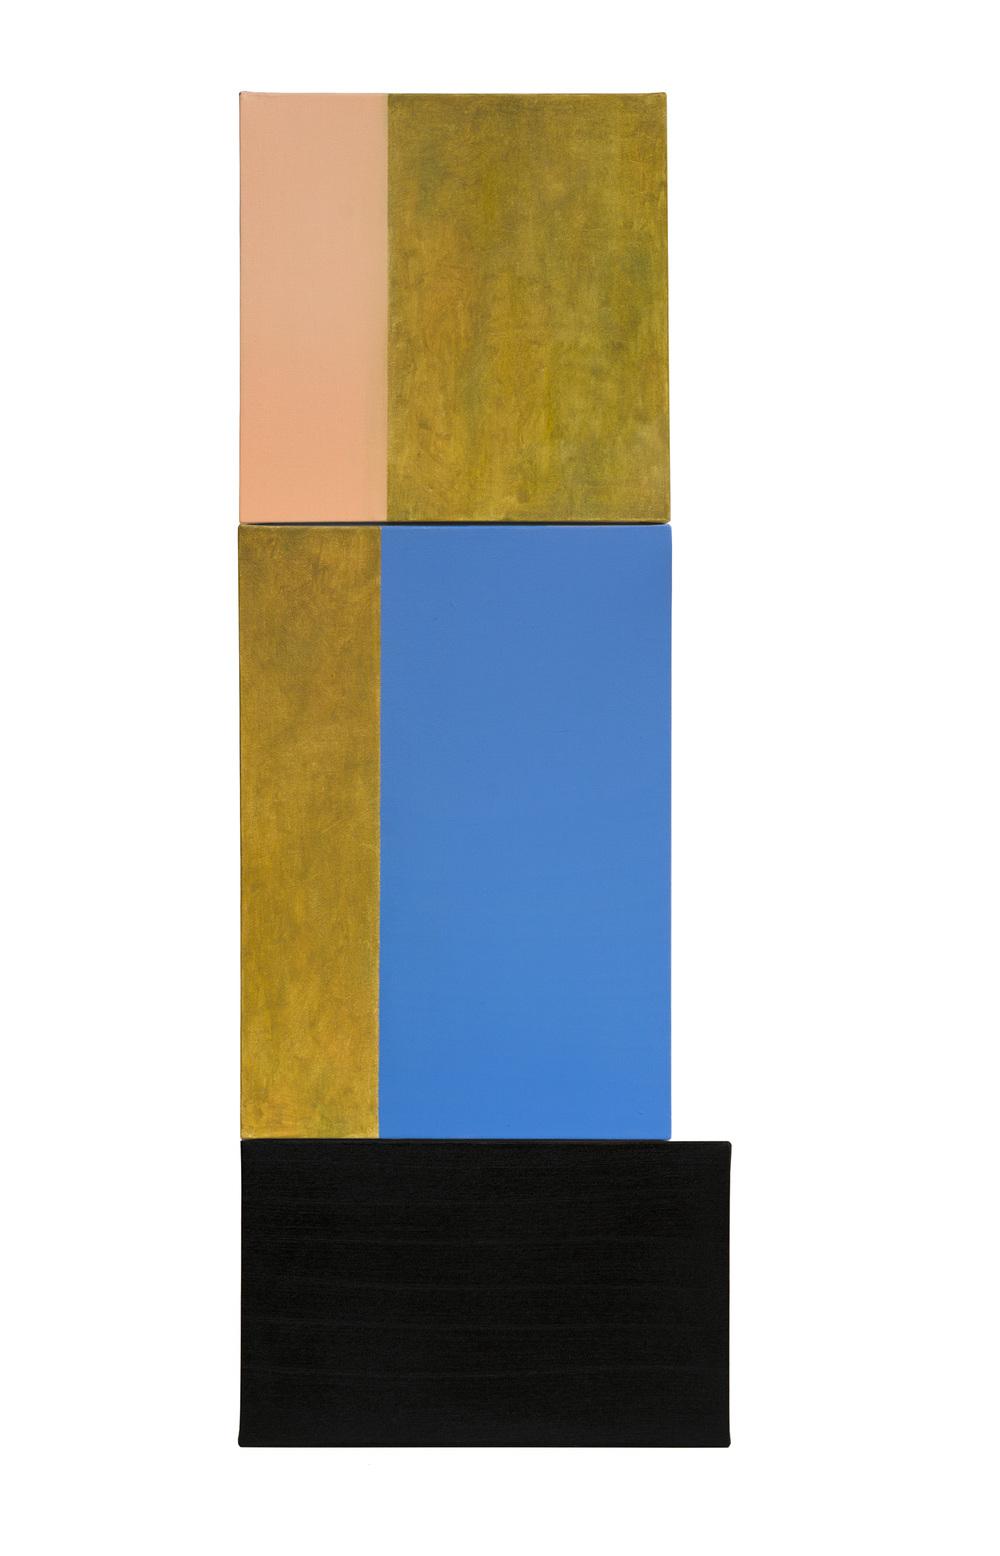 Composicion 1, Oleo sobre lienzo, 111 x 40 cms